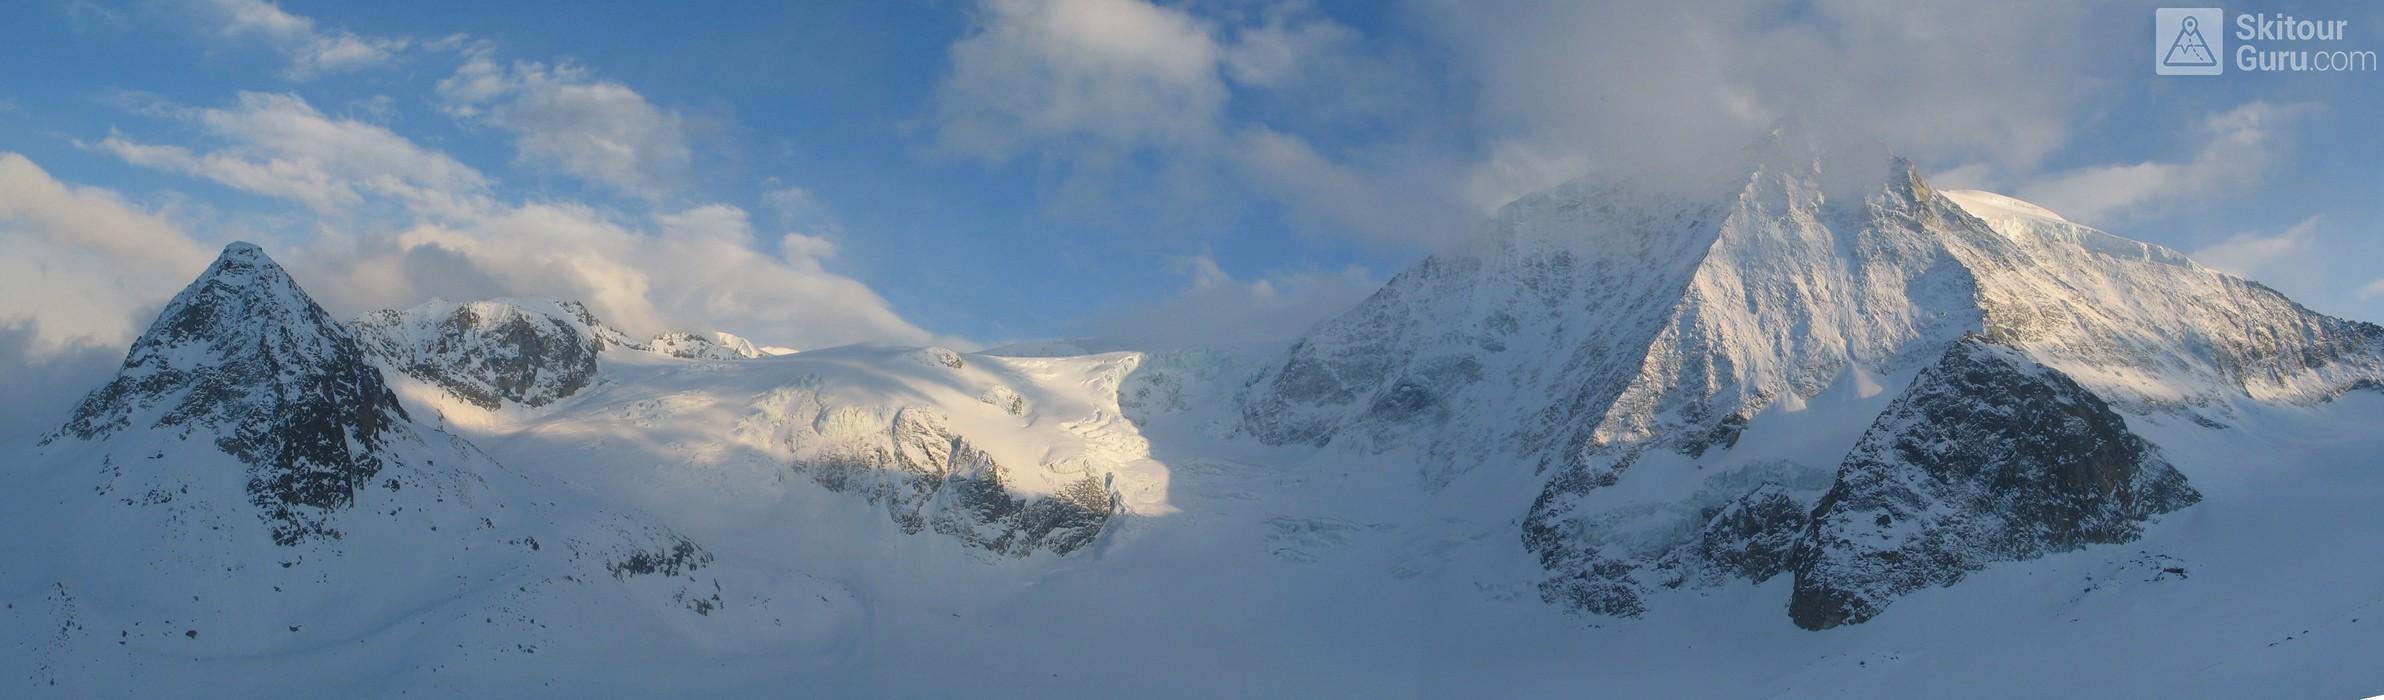 Cabane des Dix Walliser Alpen / Alpes valaisannes Switzerland panorama 14